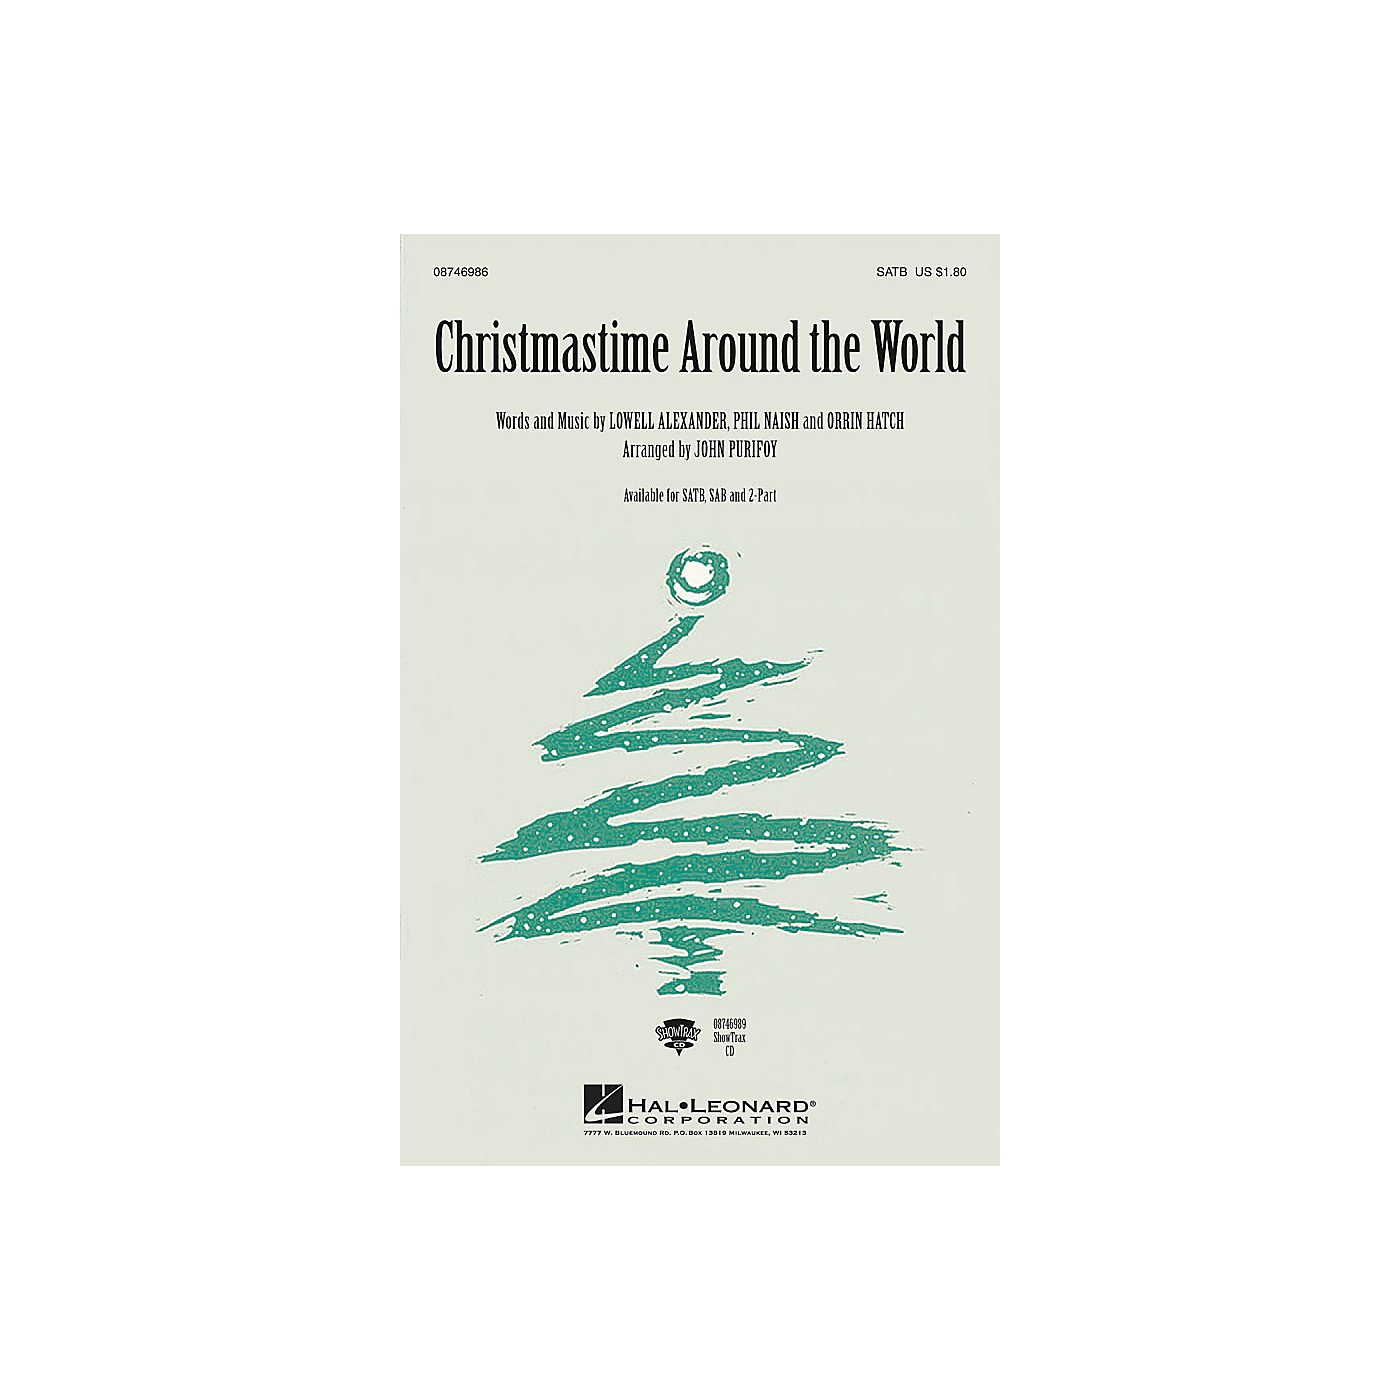 Hal Leonard Christmastime Around the World SATB arranged by John Purifoy thumbnail